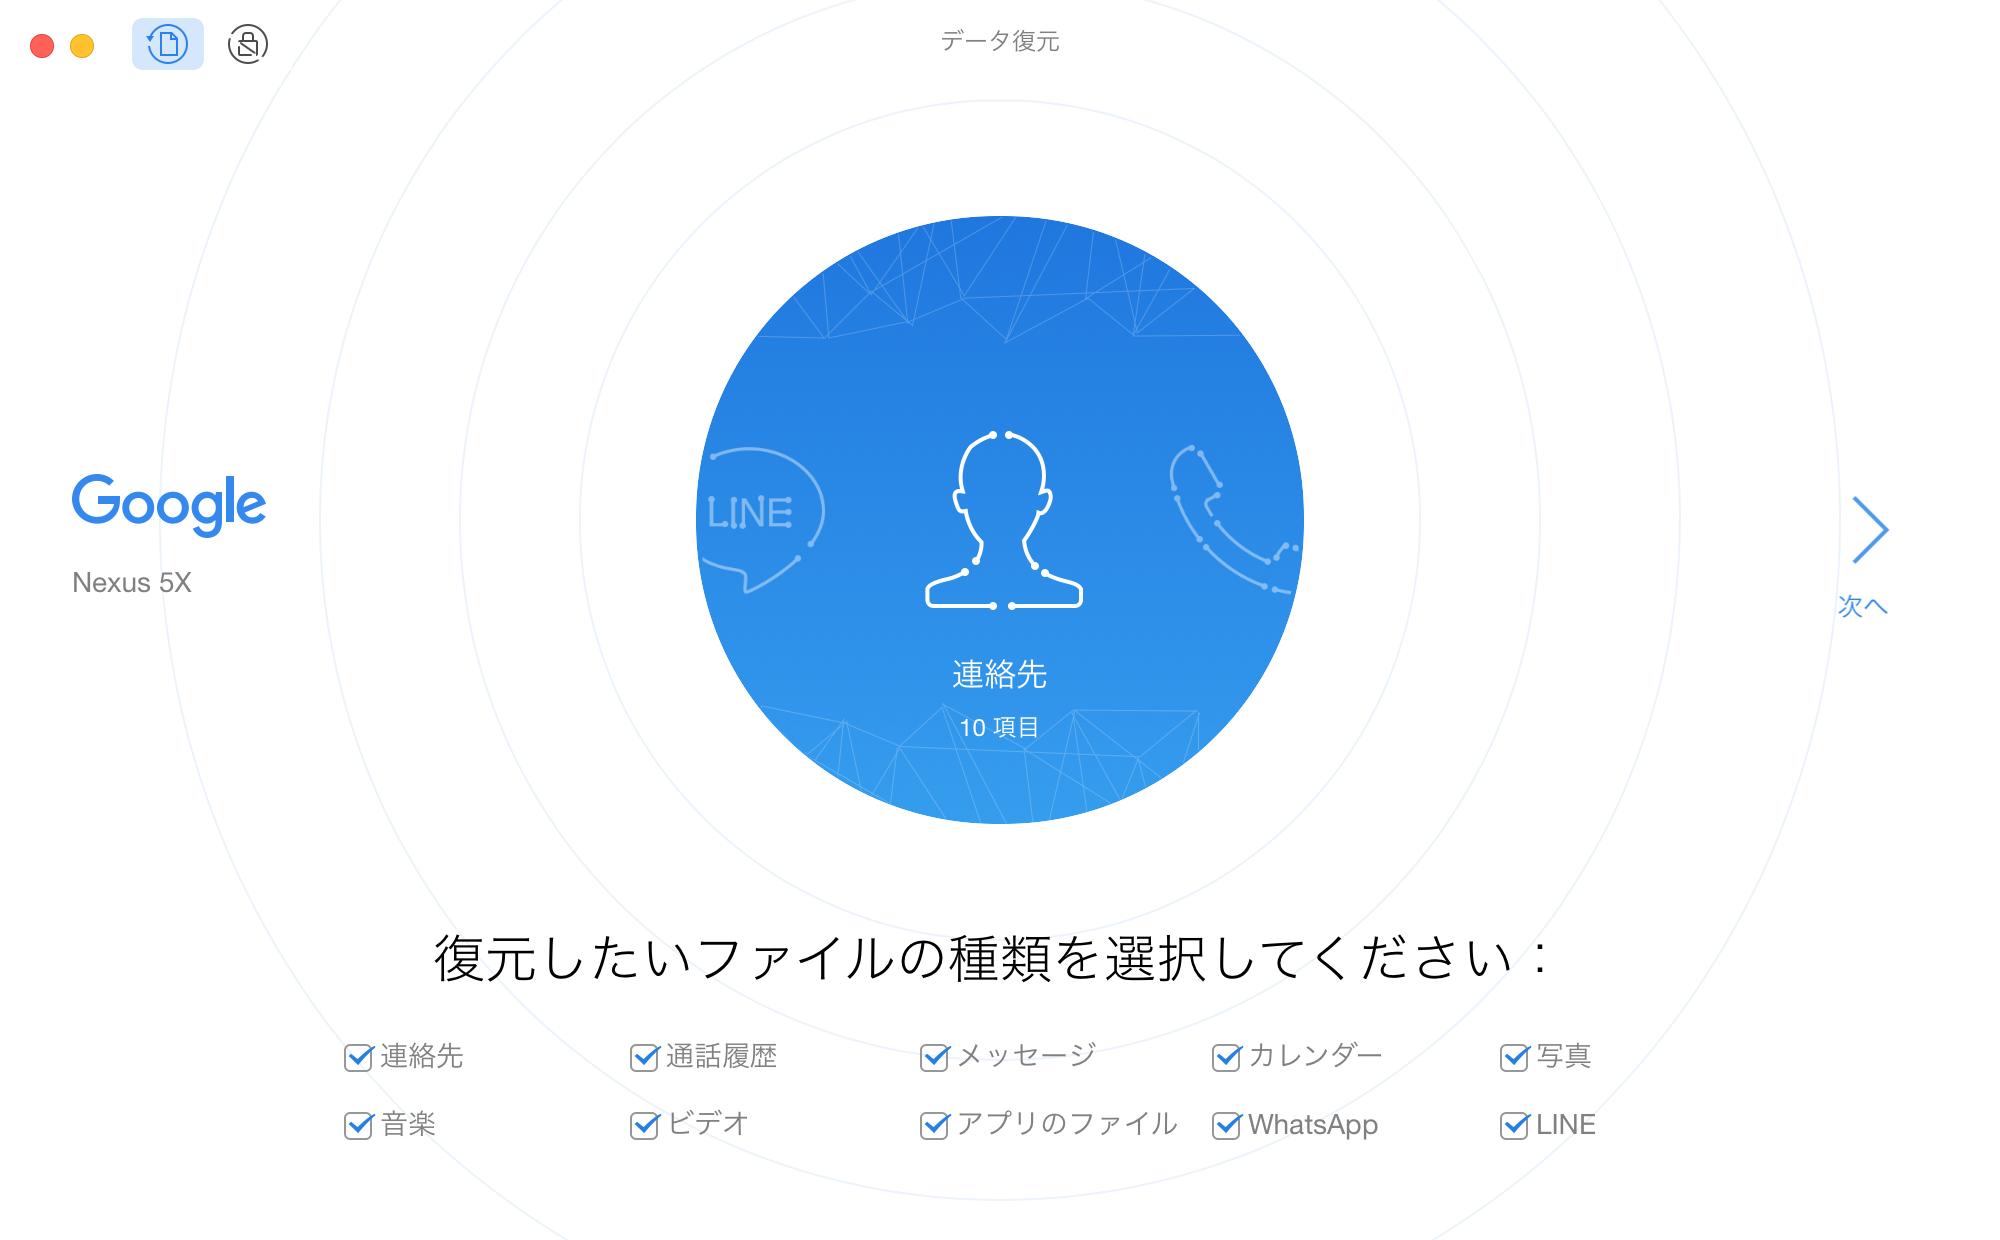 PhoneRescue - Googleデータ復元のメインインターフェース